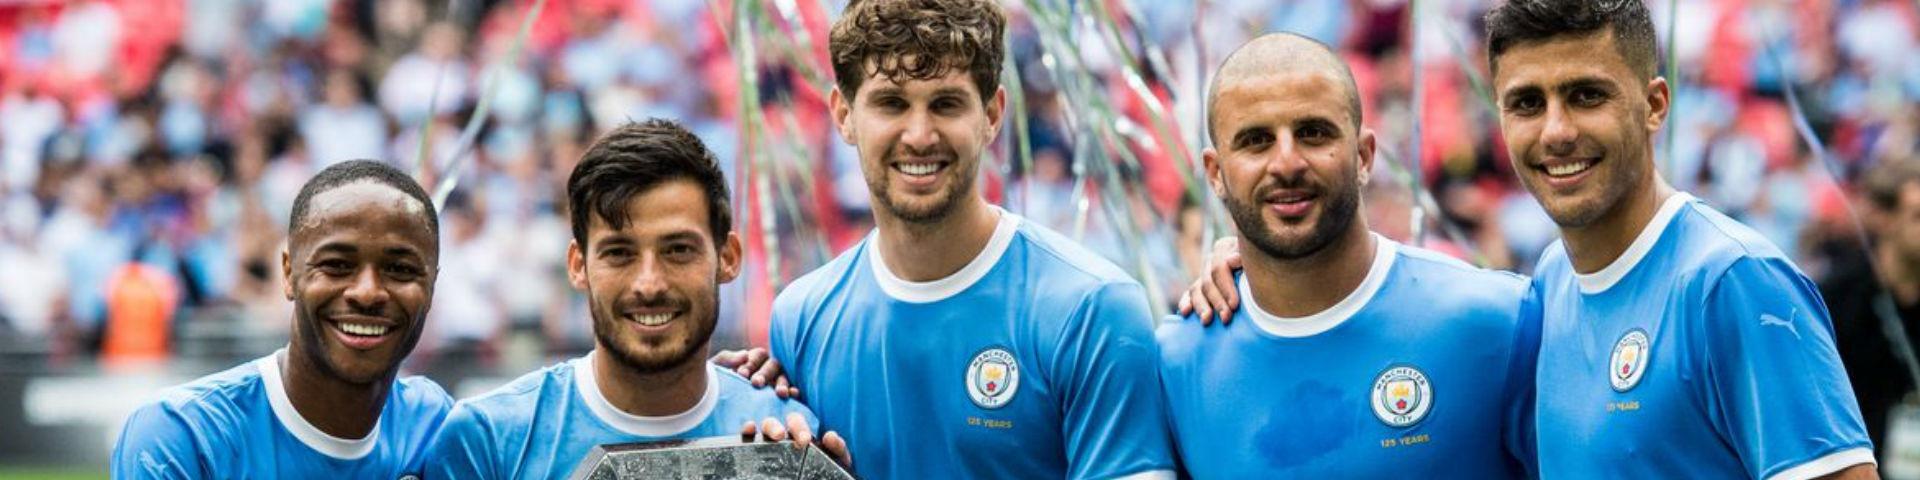 «Манчестер Сити» выиграл Суперкубок Англии